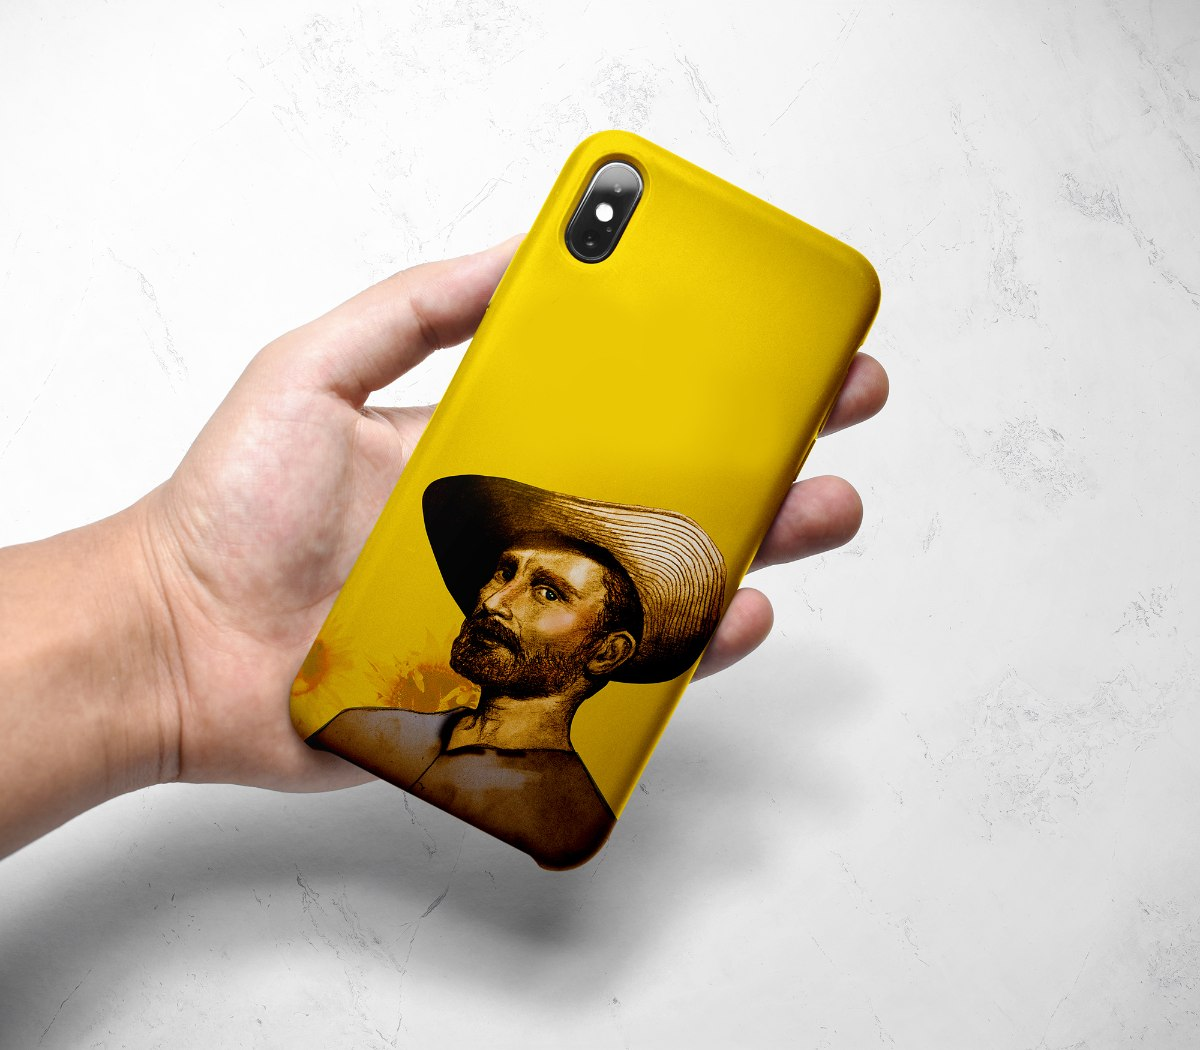 מגן לטלפון נייד - ואן גוך